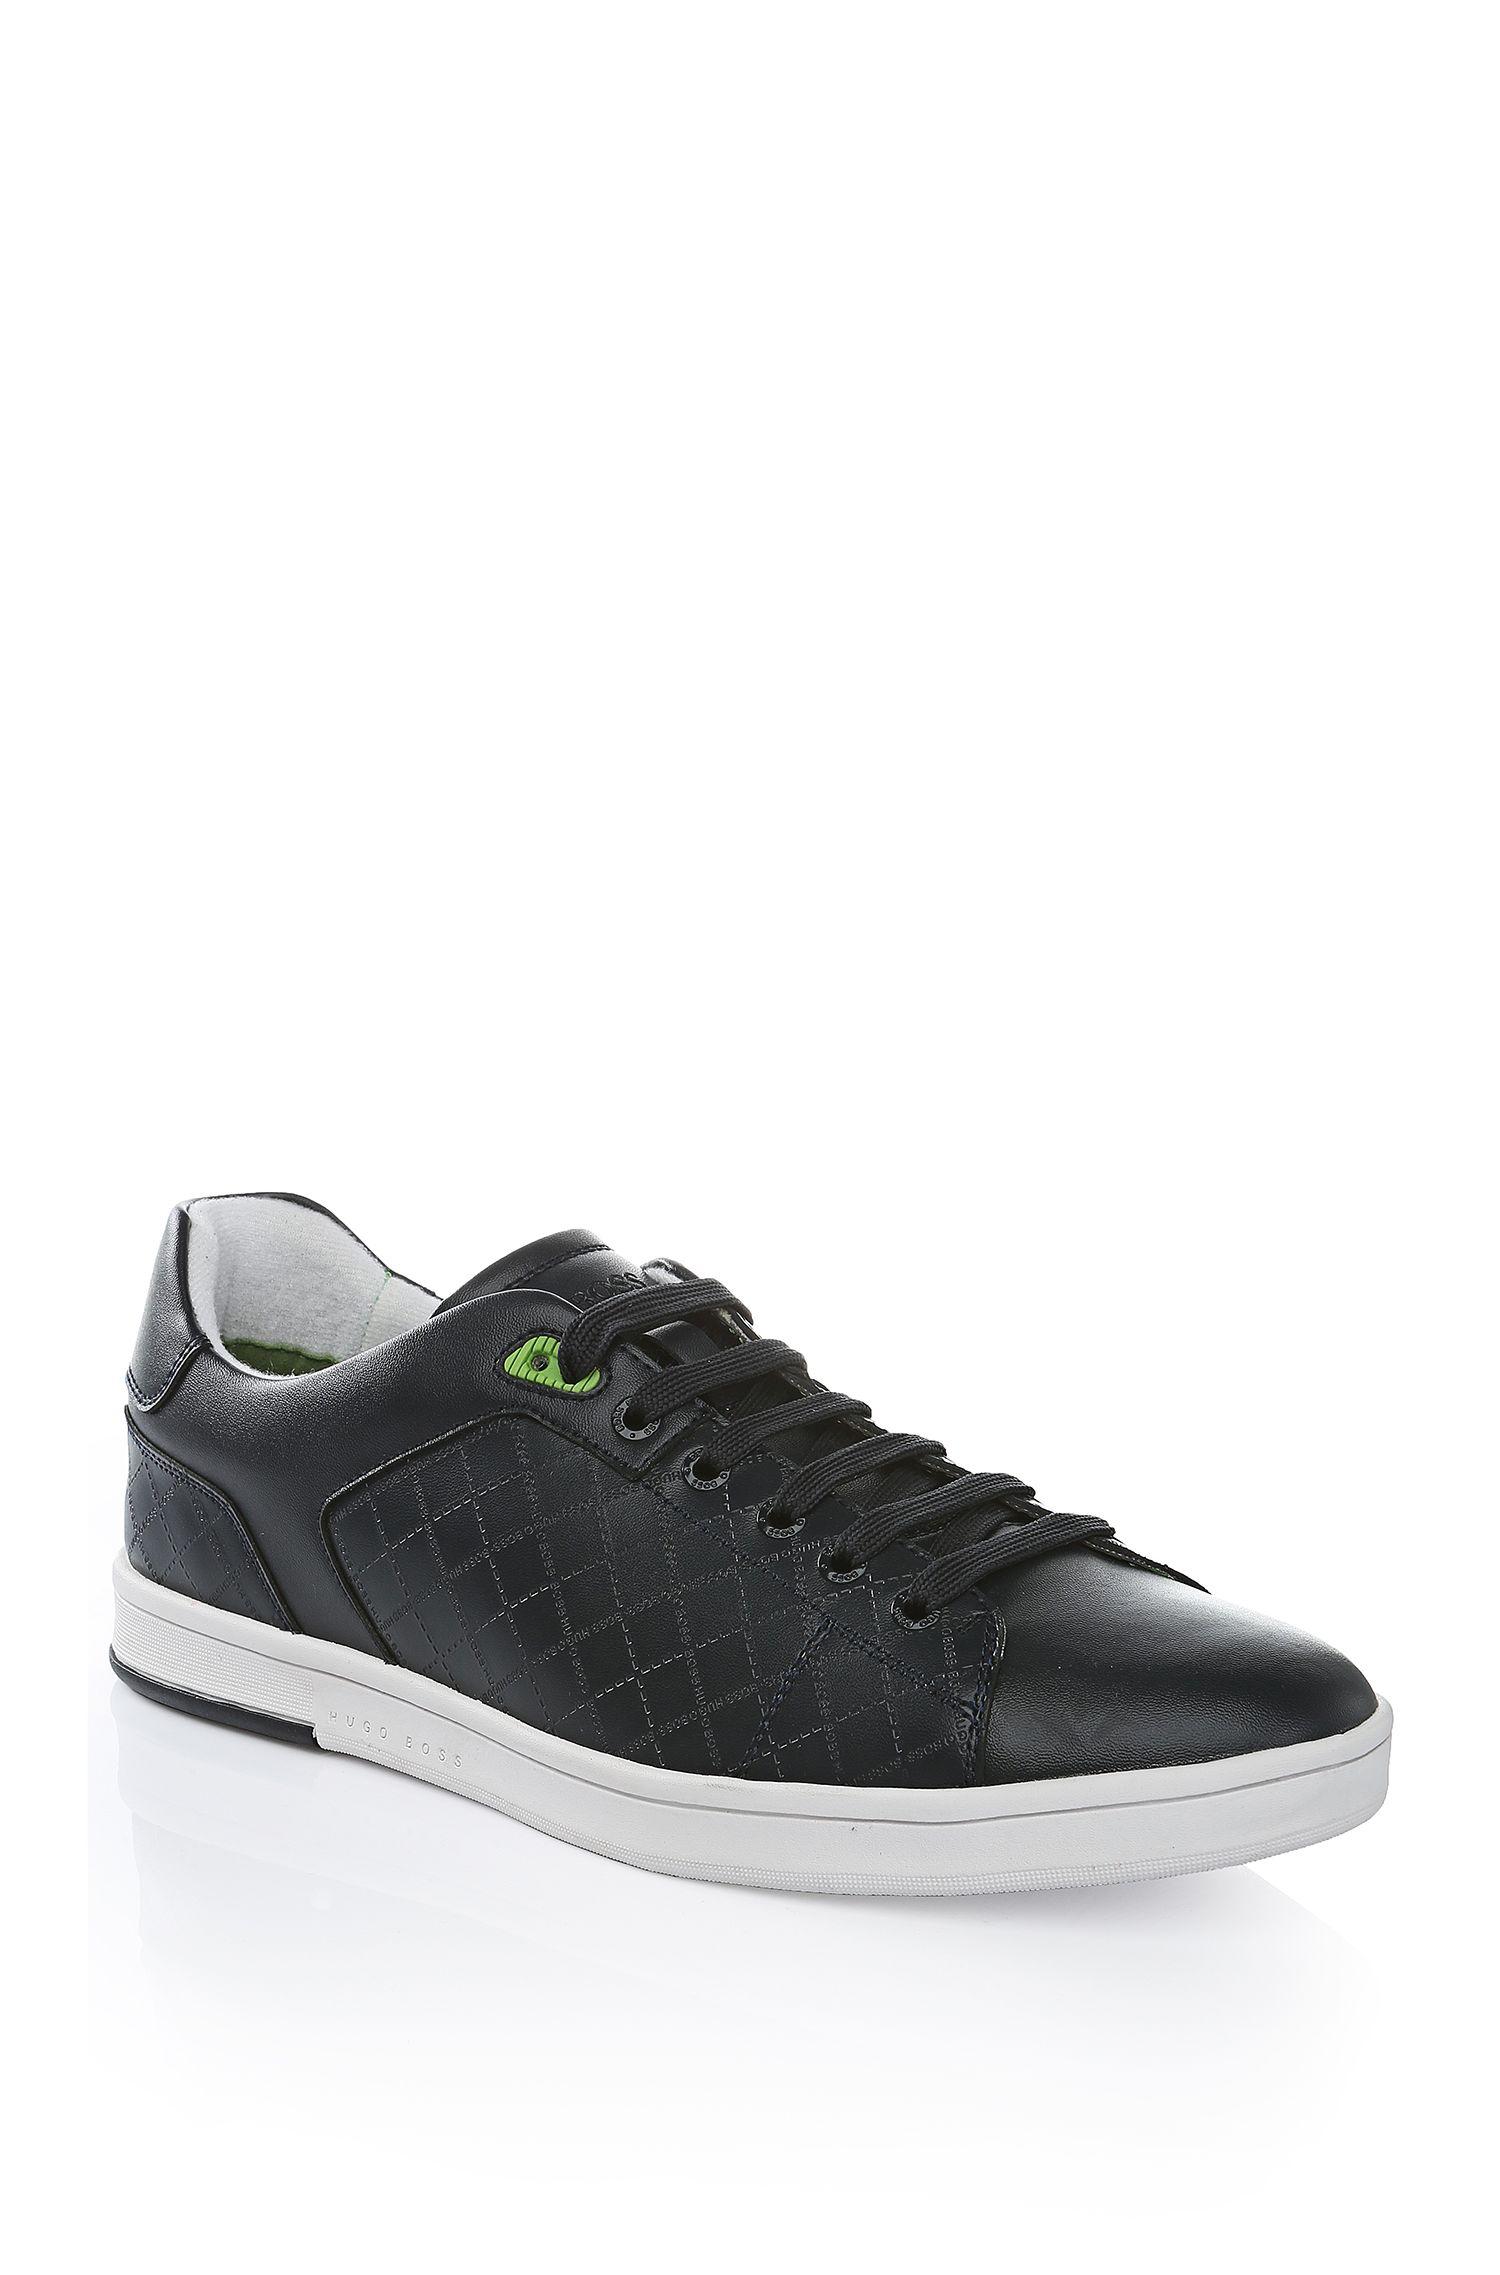 Geprägte Leder-Sneakers: ´Ray Check`